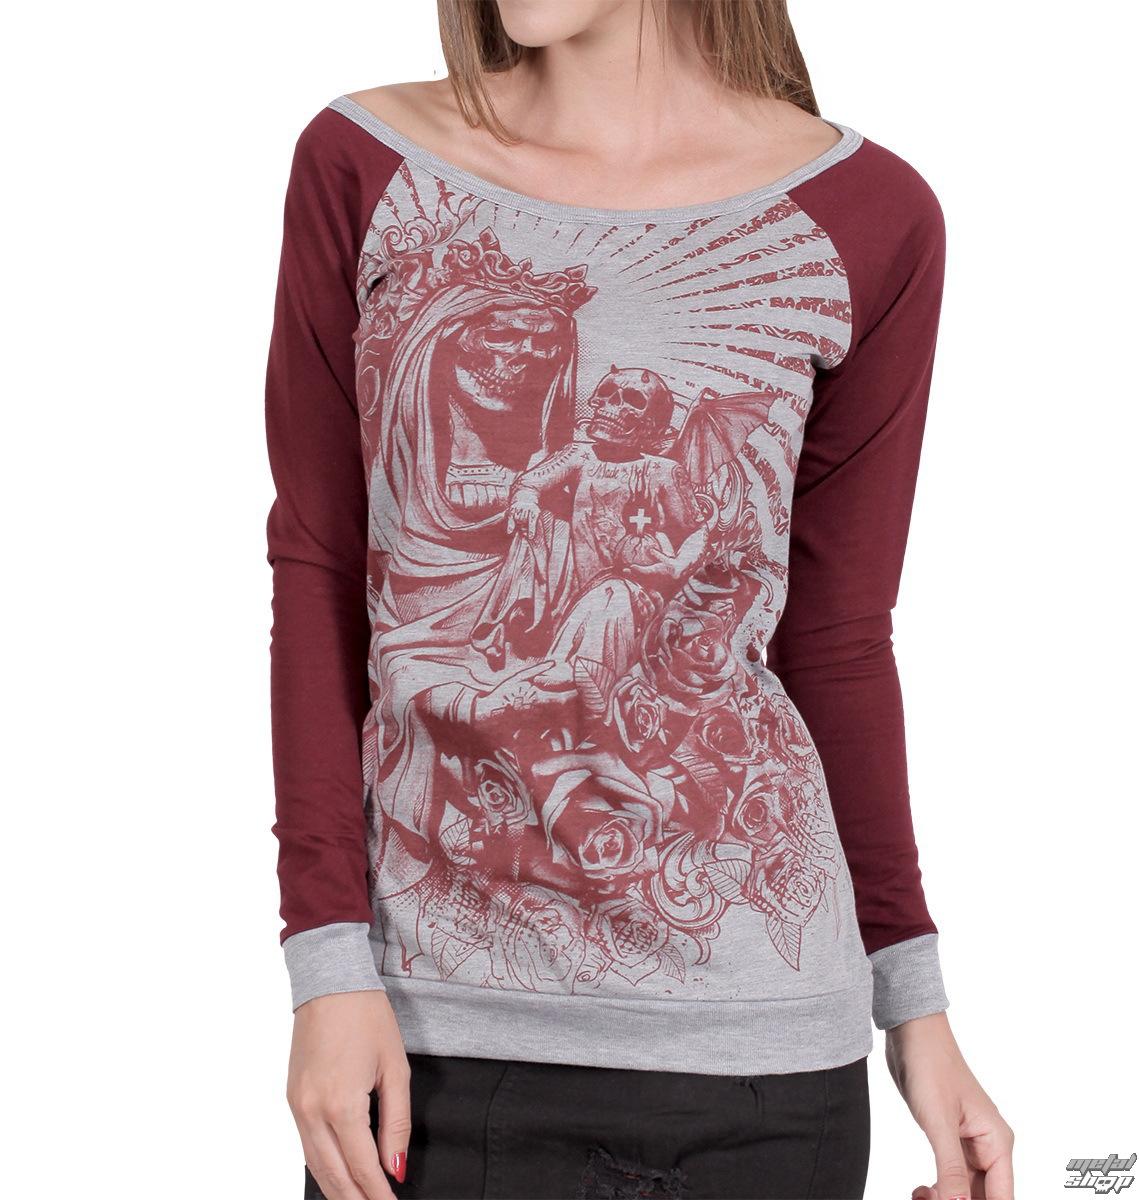 396c10aff5d6 tričko dámske s dlhým rukávom HYRAW - Black Santa - HY156 - metalshop.sk